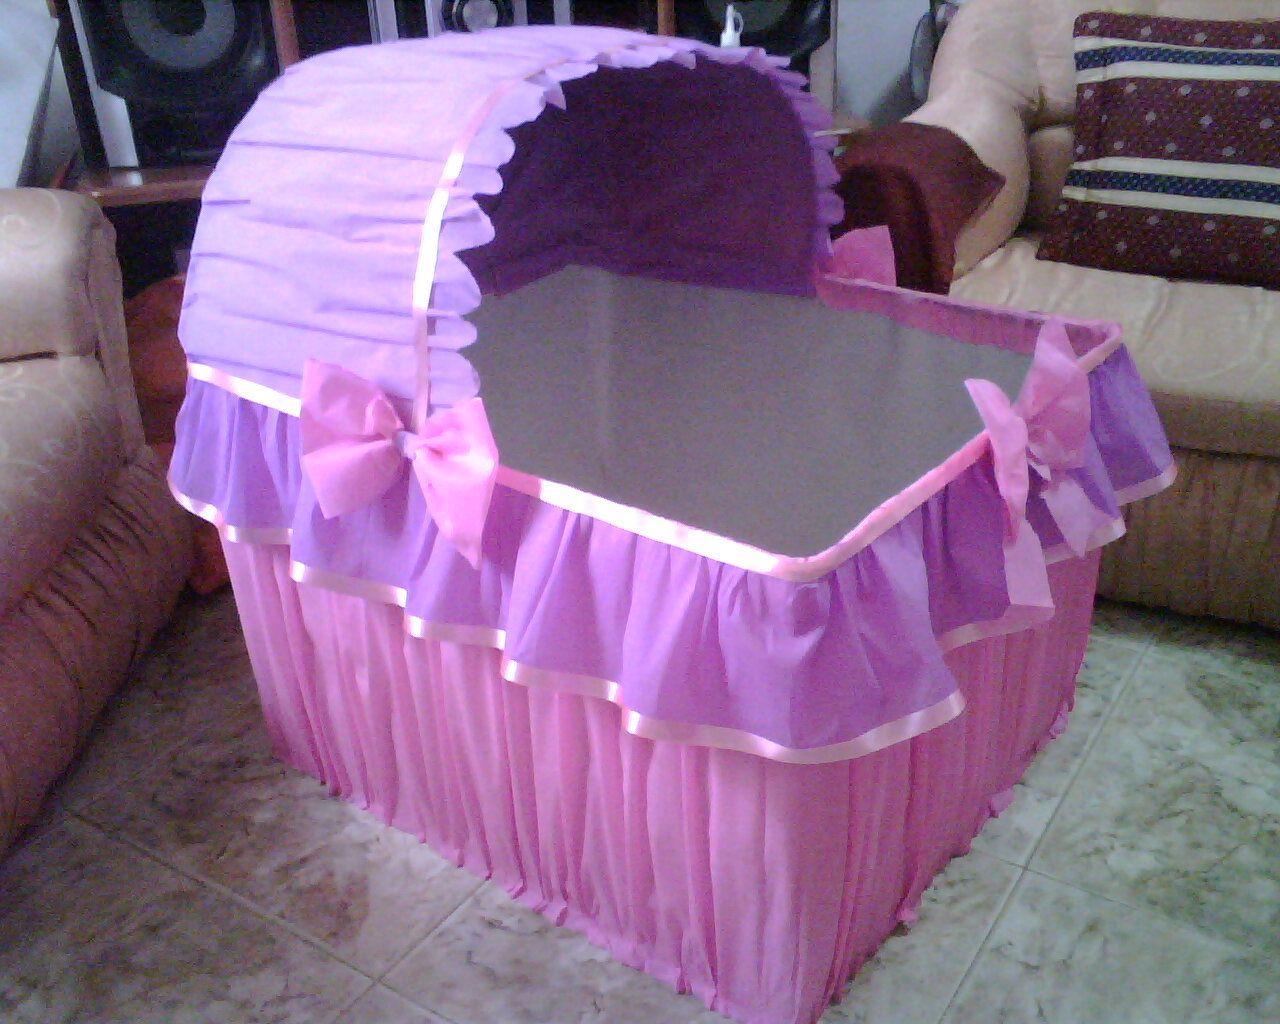 Adornos Para Mesa De Regalos De Baby Shower.Como Decorar Caja De Regalos Para Baby Shower Imagui